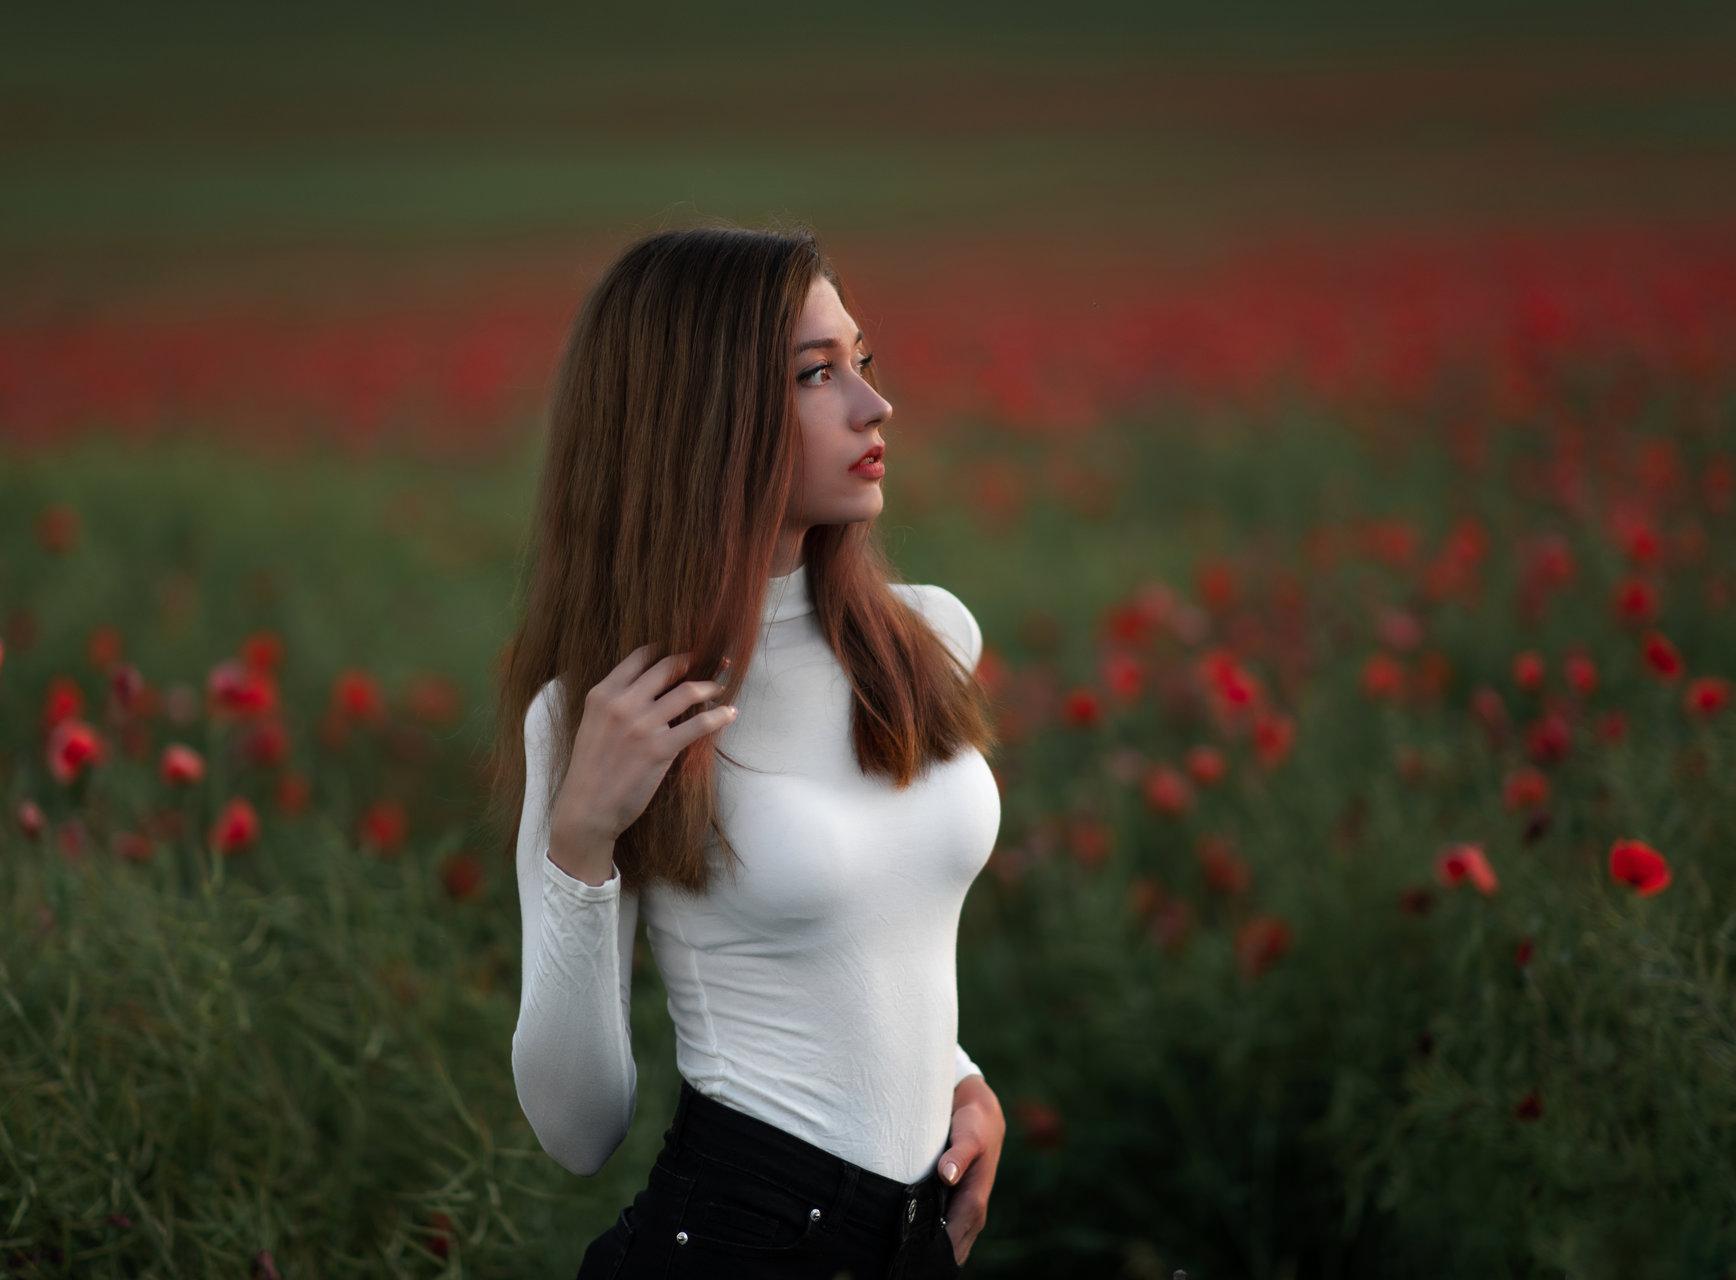 Ева   Author Иво Герасимов - ubobg   PHOTO FORUM